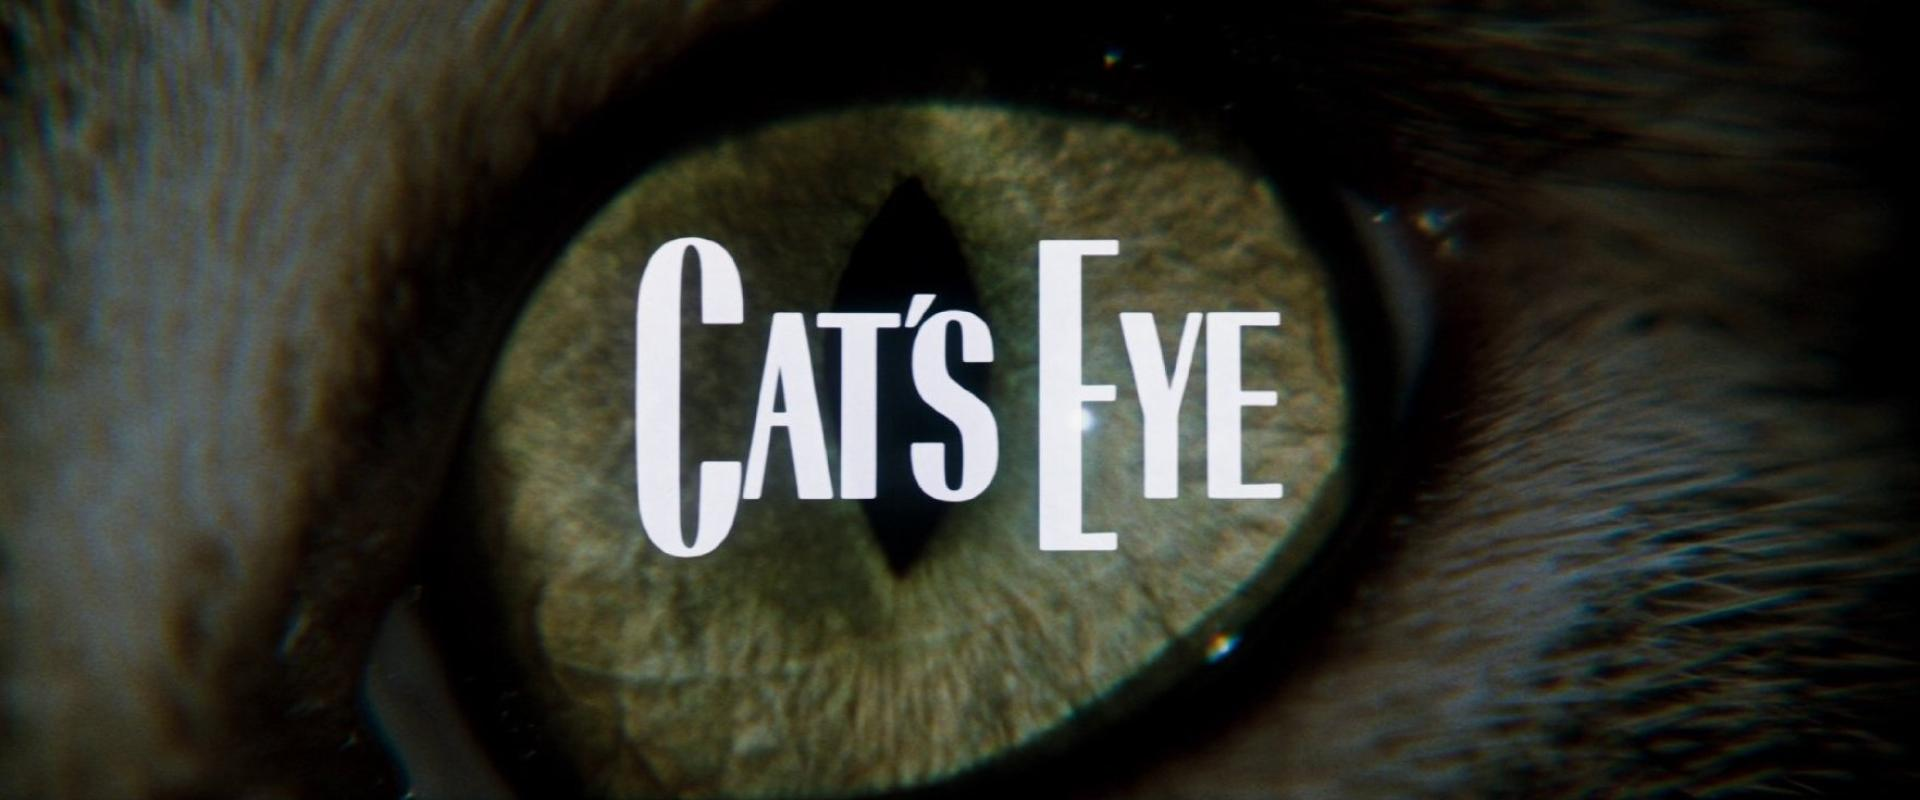 Cat's Eye - Macskaszem (1985)